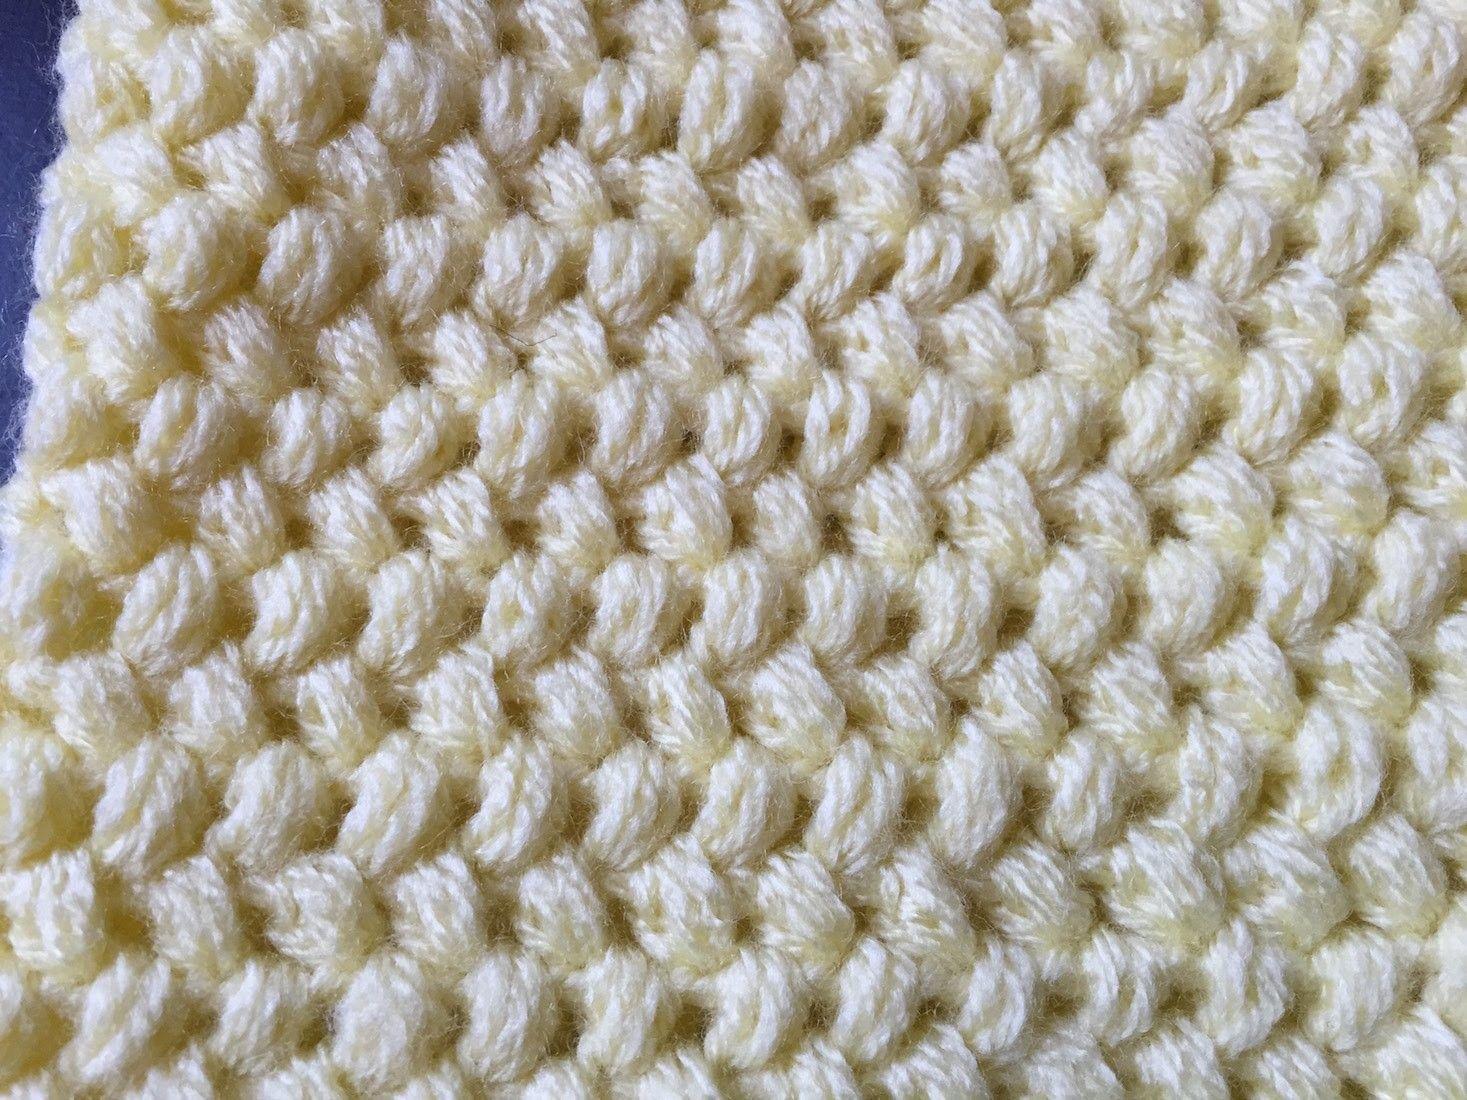 Tuto Facile Point Fantaisie 1 Au Crochet Gistosa Tejer